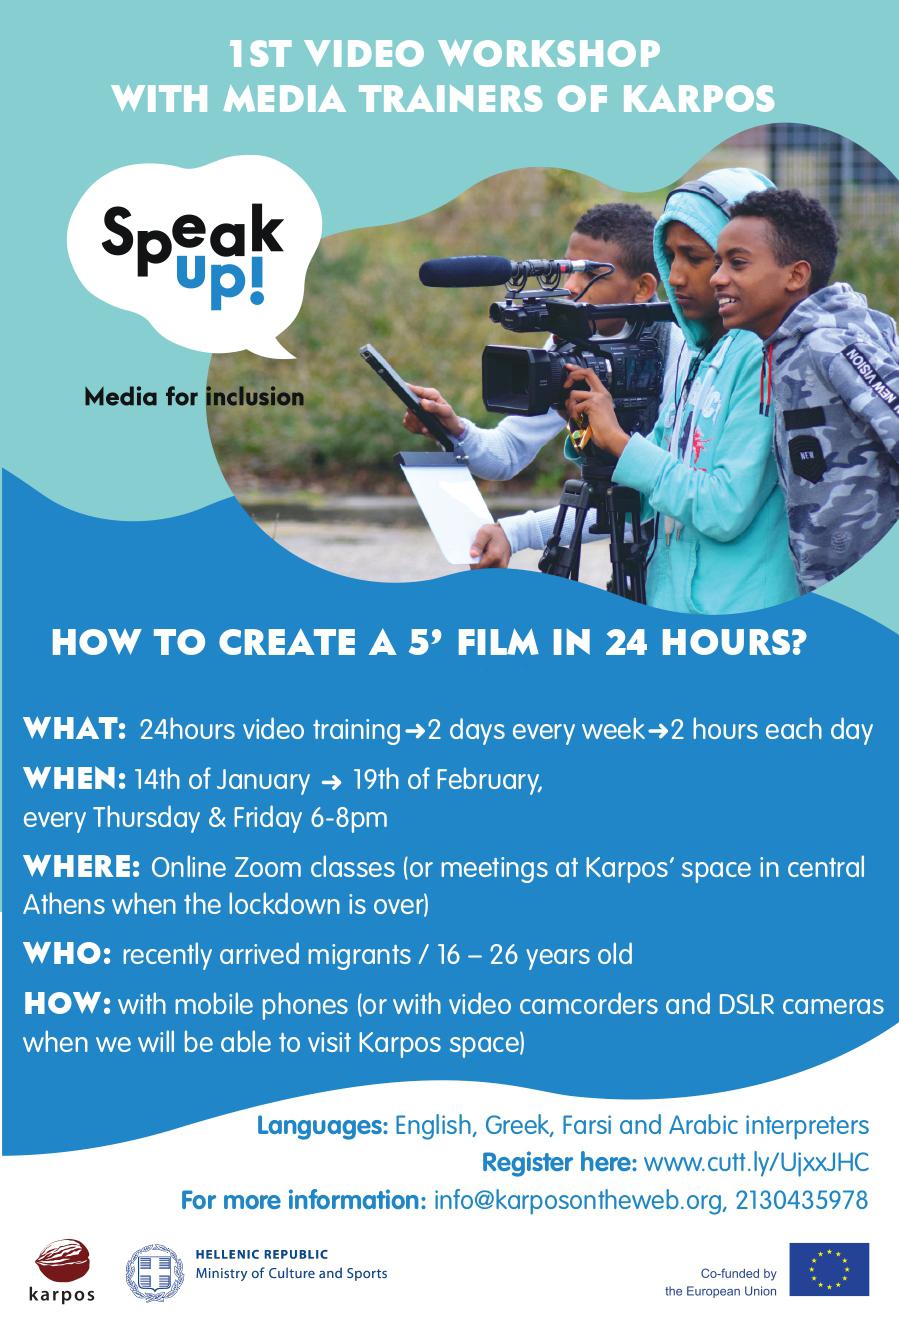 SpeakUp_card_A5_1st workshop2